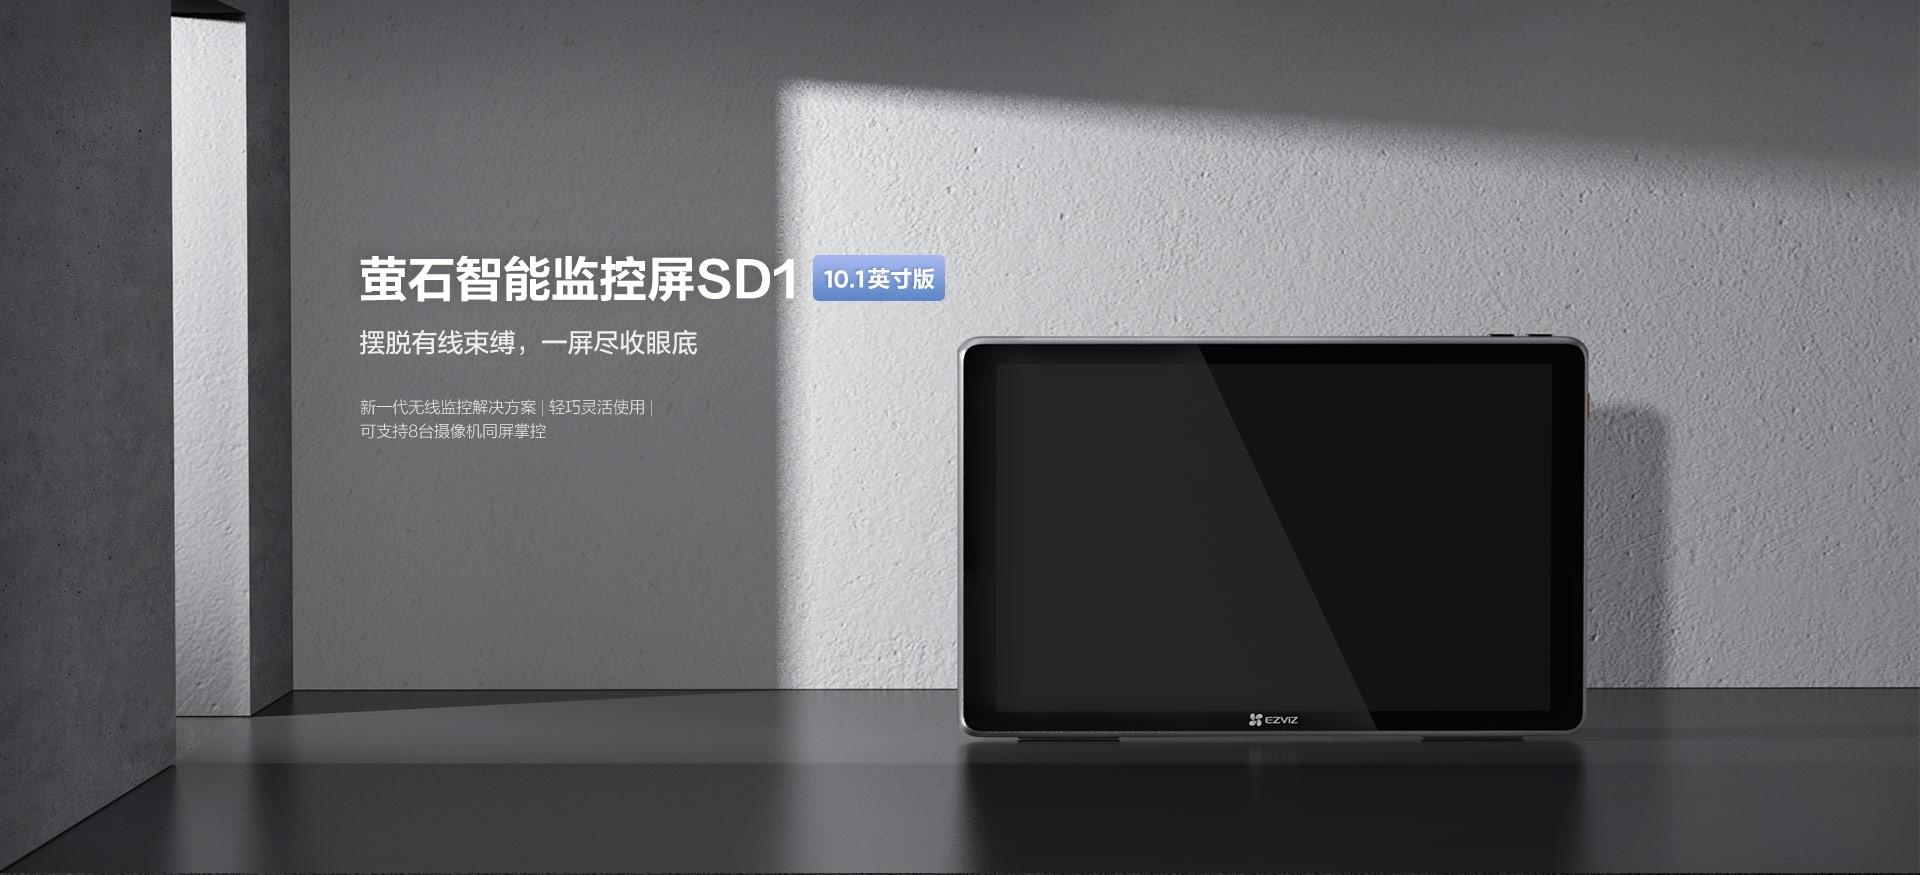 SD1-web_01.jpg